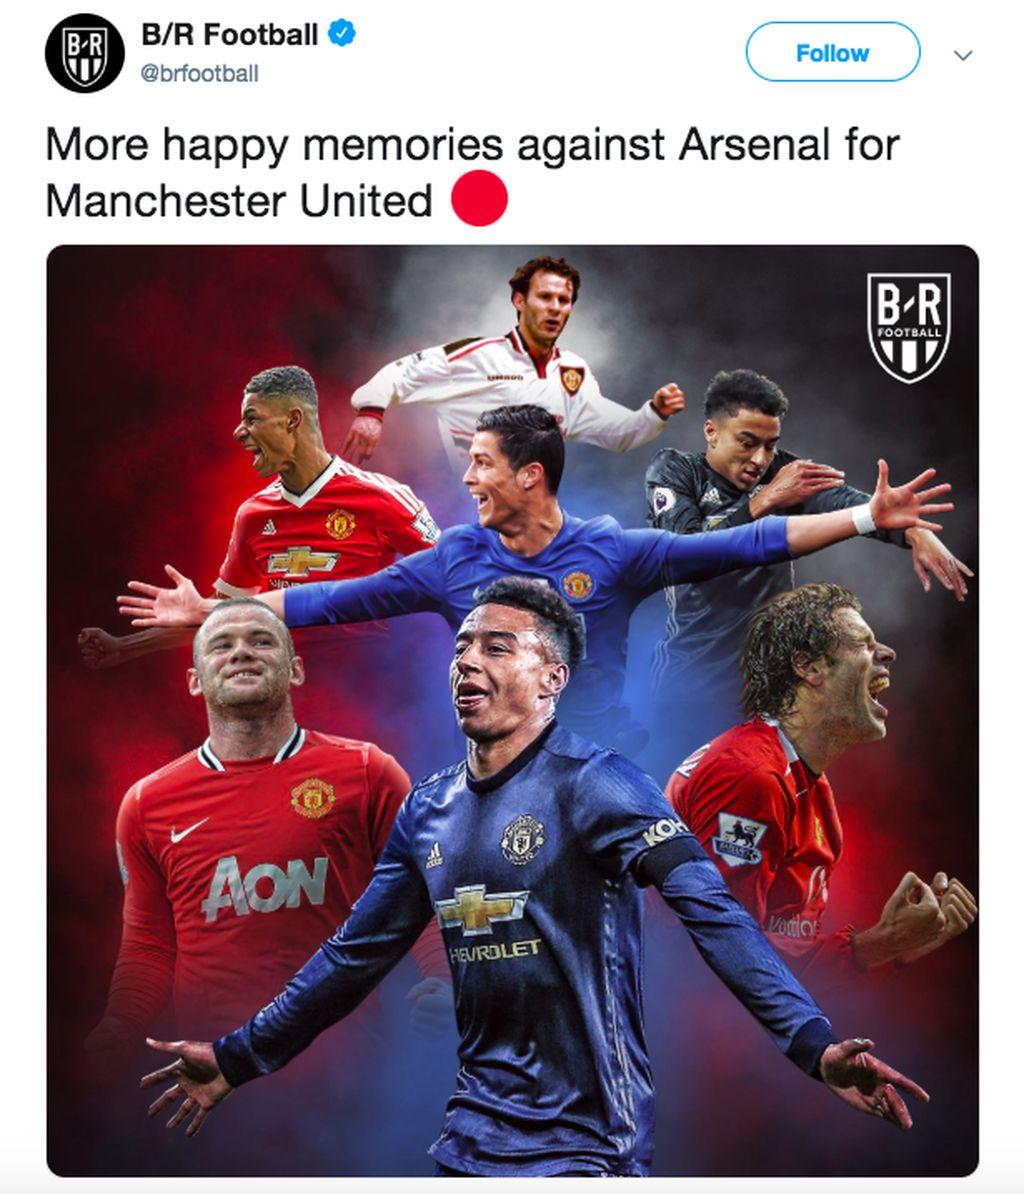 Kemenangan atas Arsenal membangkitkan kenangan Manchester United masa silam saat dulu juga menaklukkan Arsenal melalui para pemain bintang. Foto: istimewa